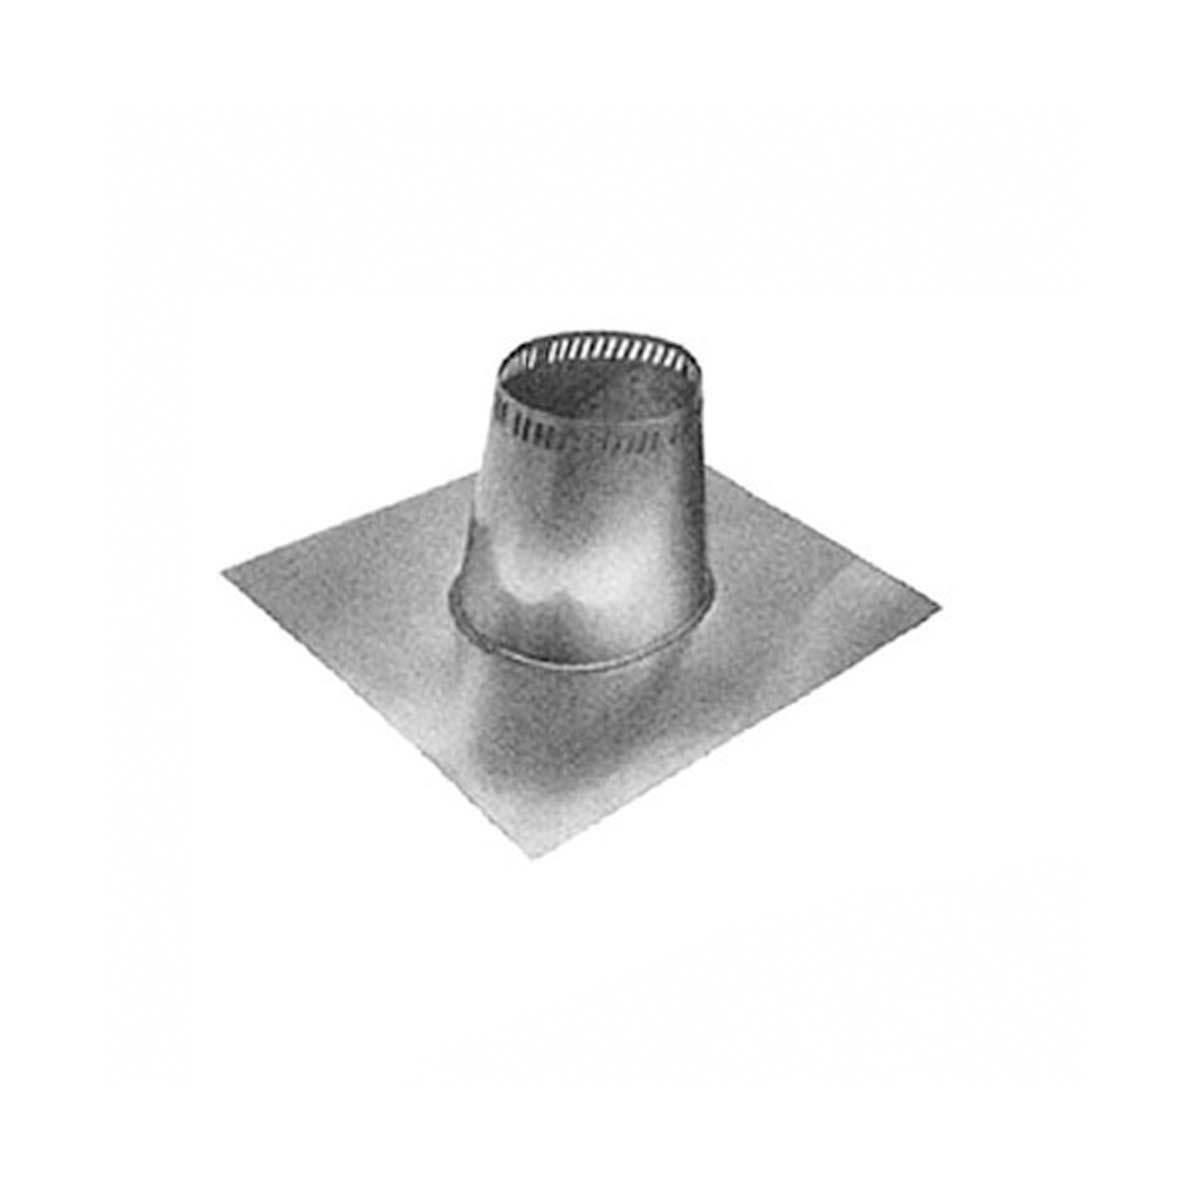 Flat Tall Cone Roof Flashing (0-12 2/12)